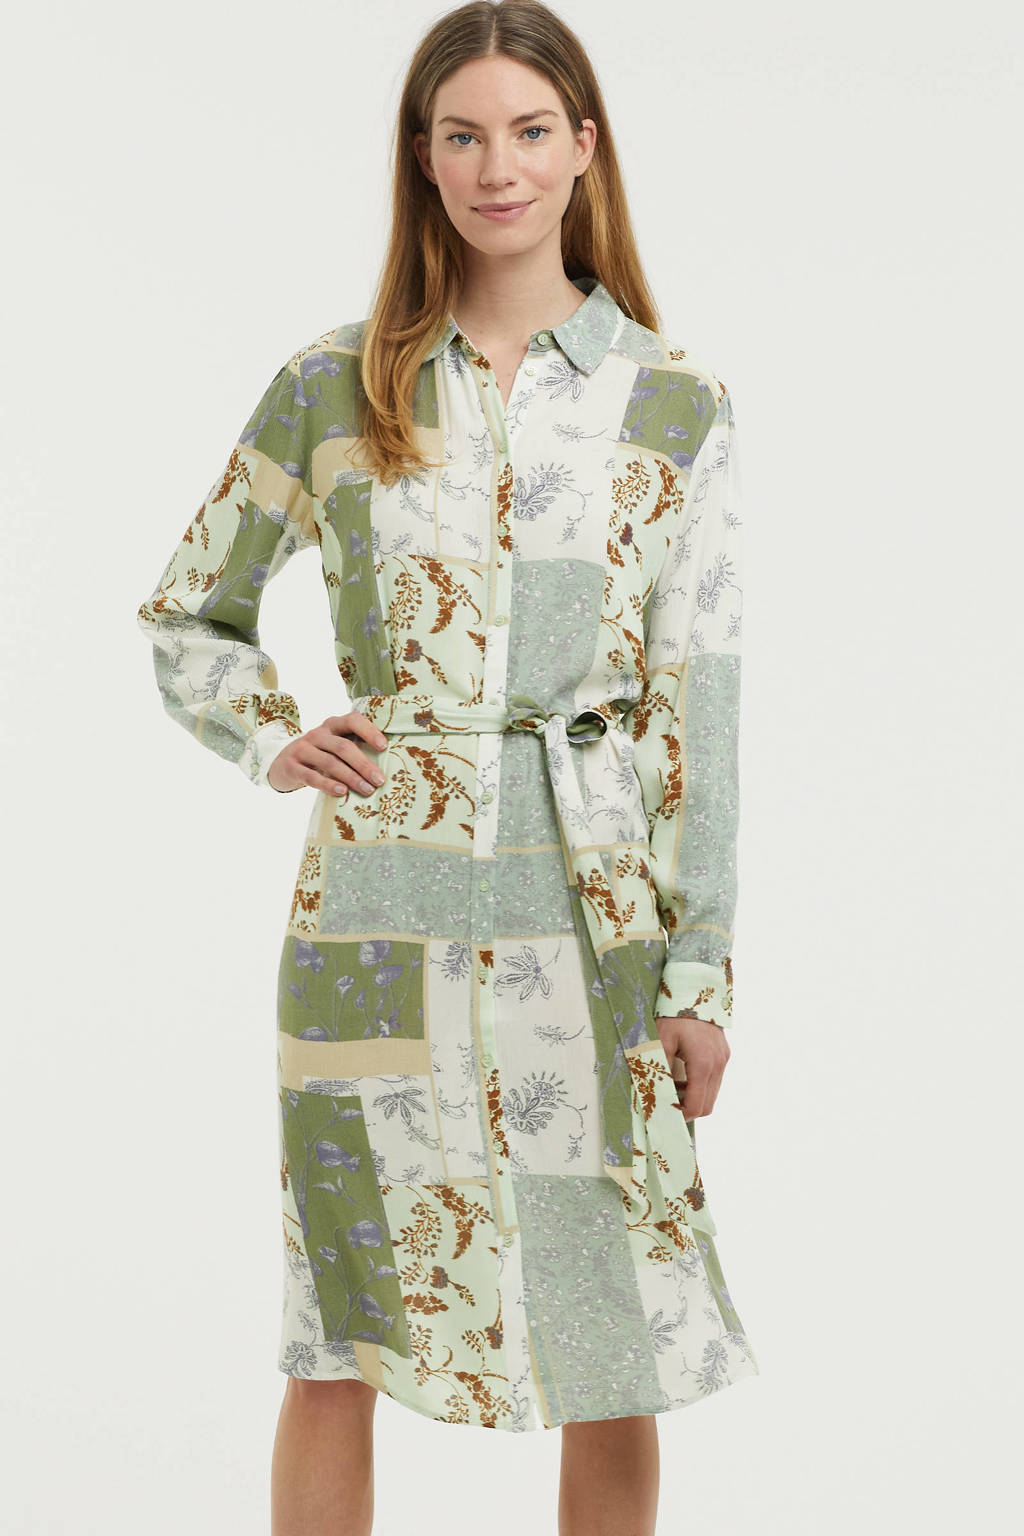 Fransa gebloemde blousejurk groen/wit/donkerrood, Groen/wit/donkerrood